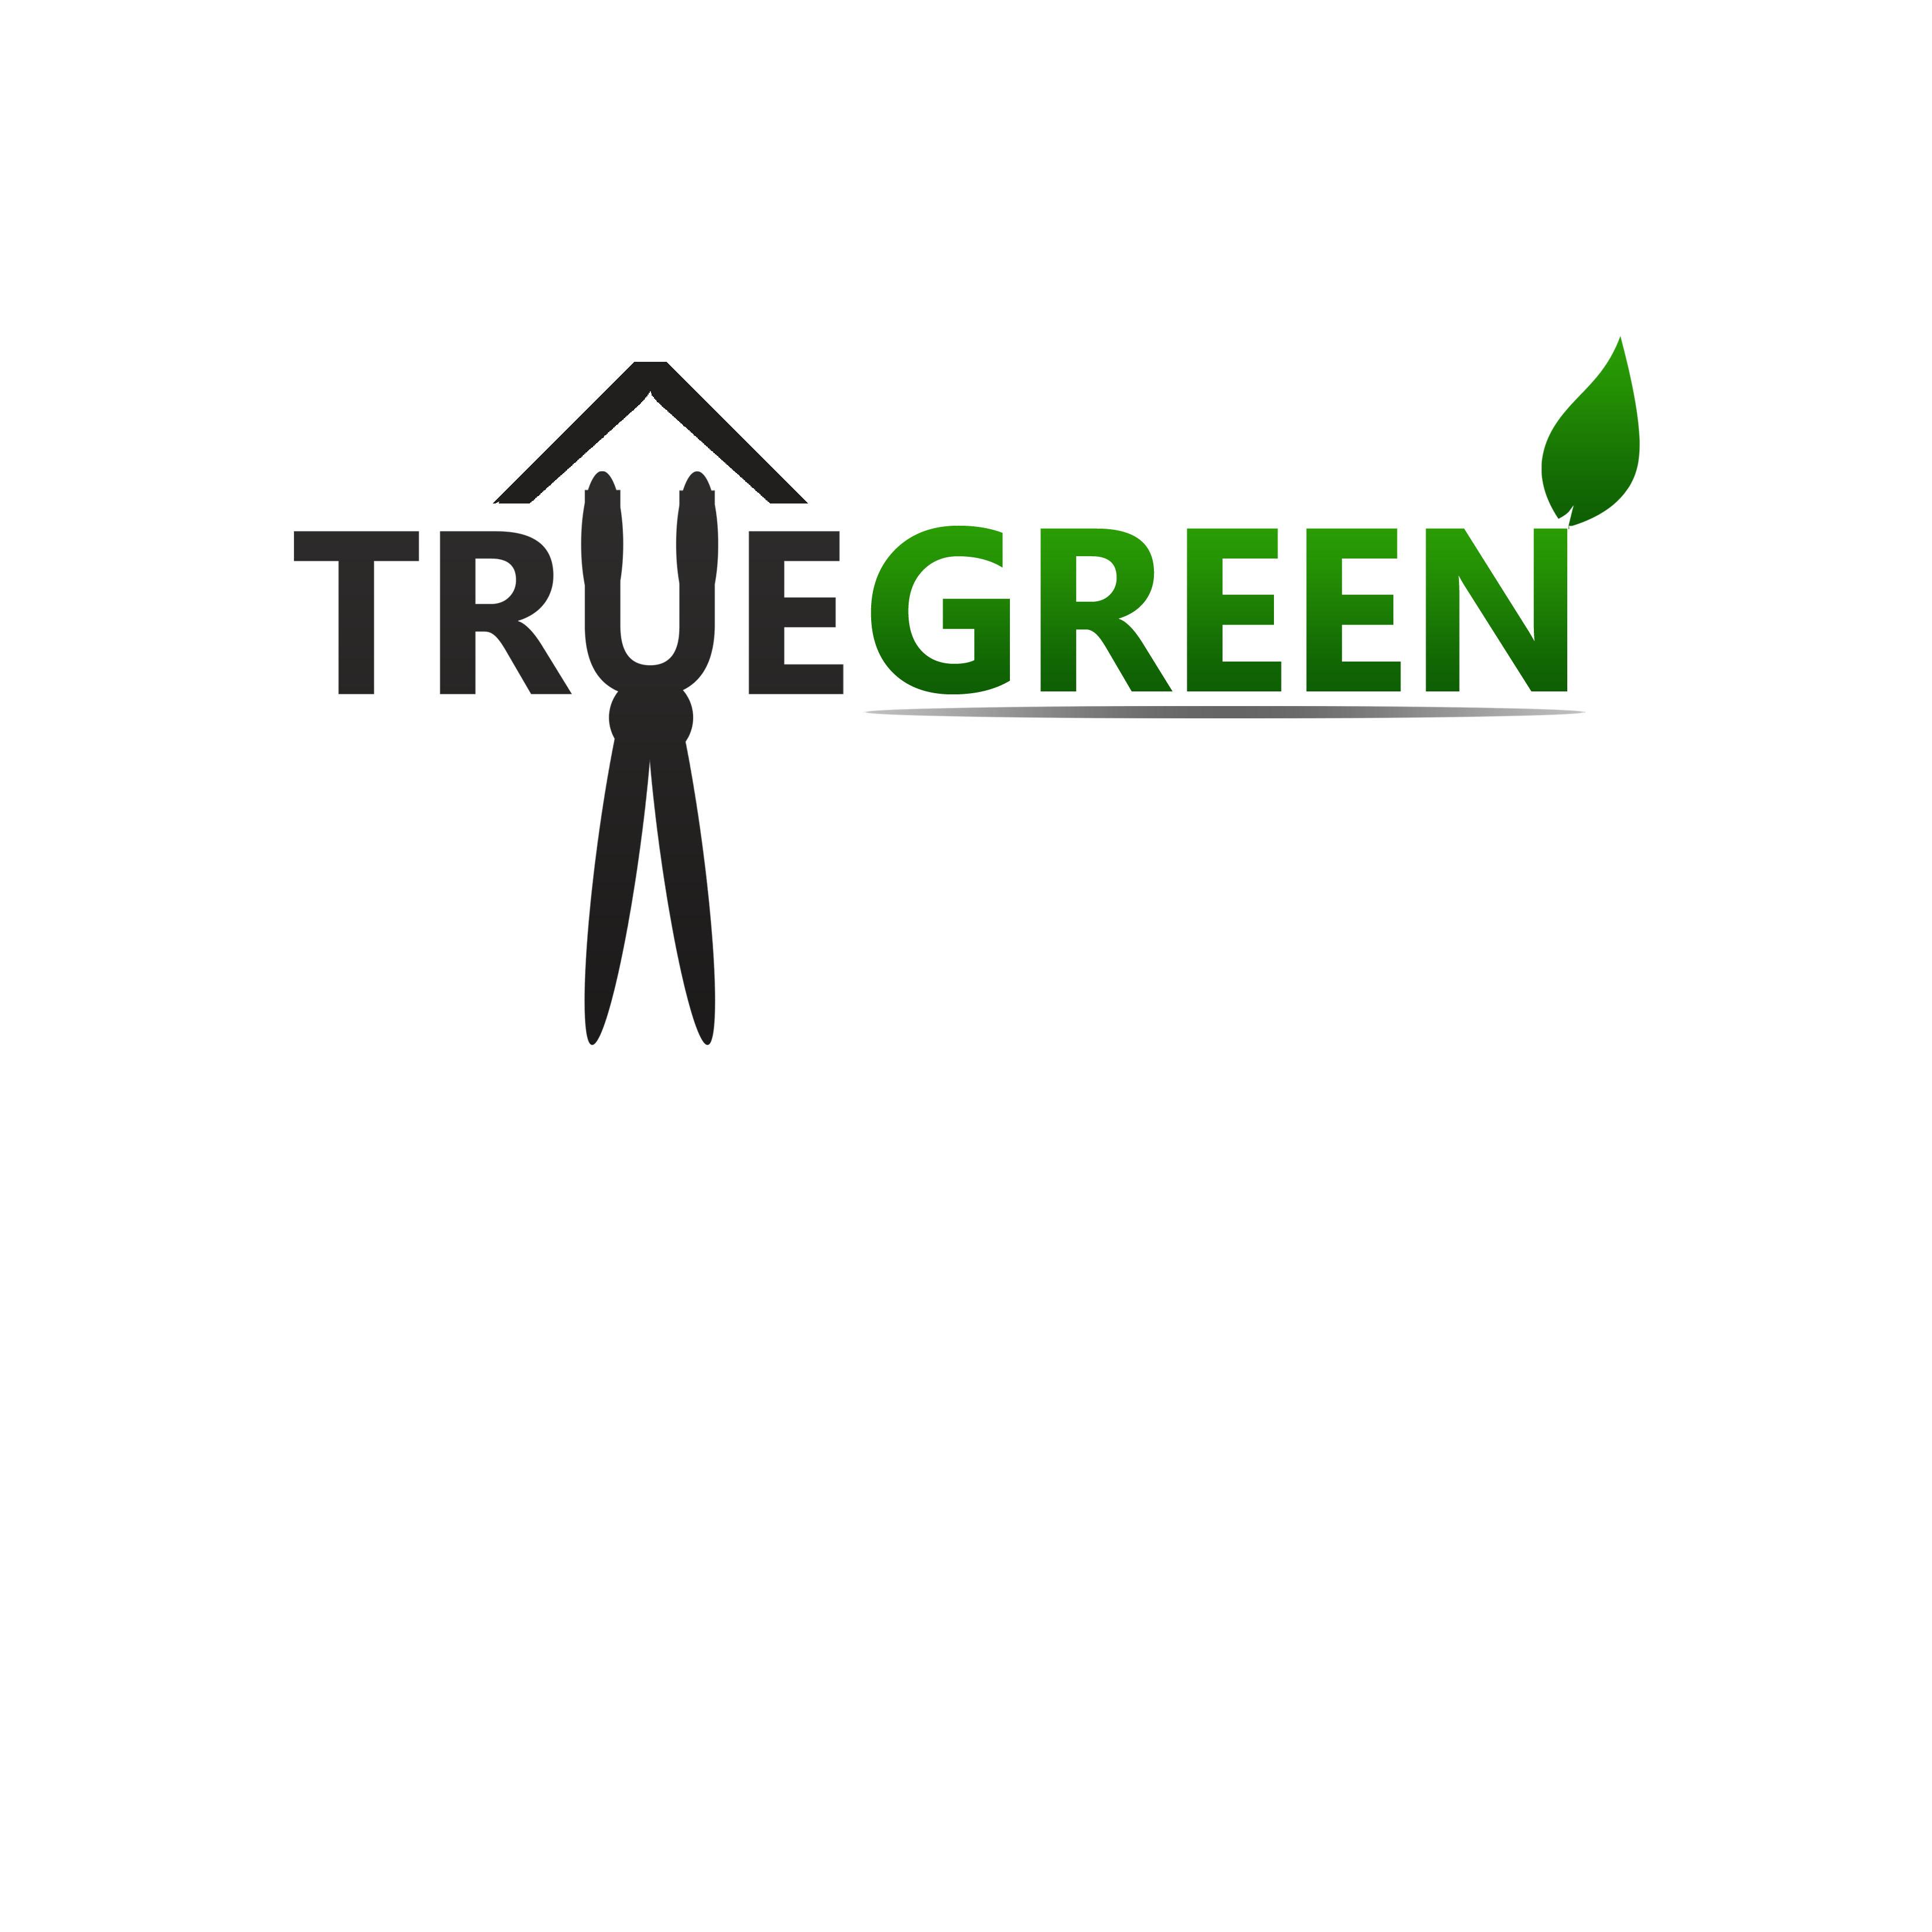 Logo Design by Allan Esclamado - Entry No. 79 in the Logo Design Contest Fun Logo Design for TRUE GREEN.